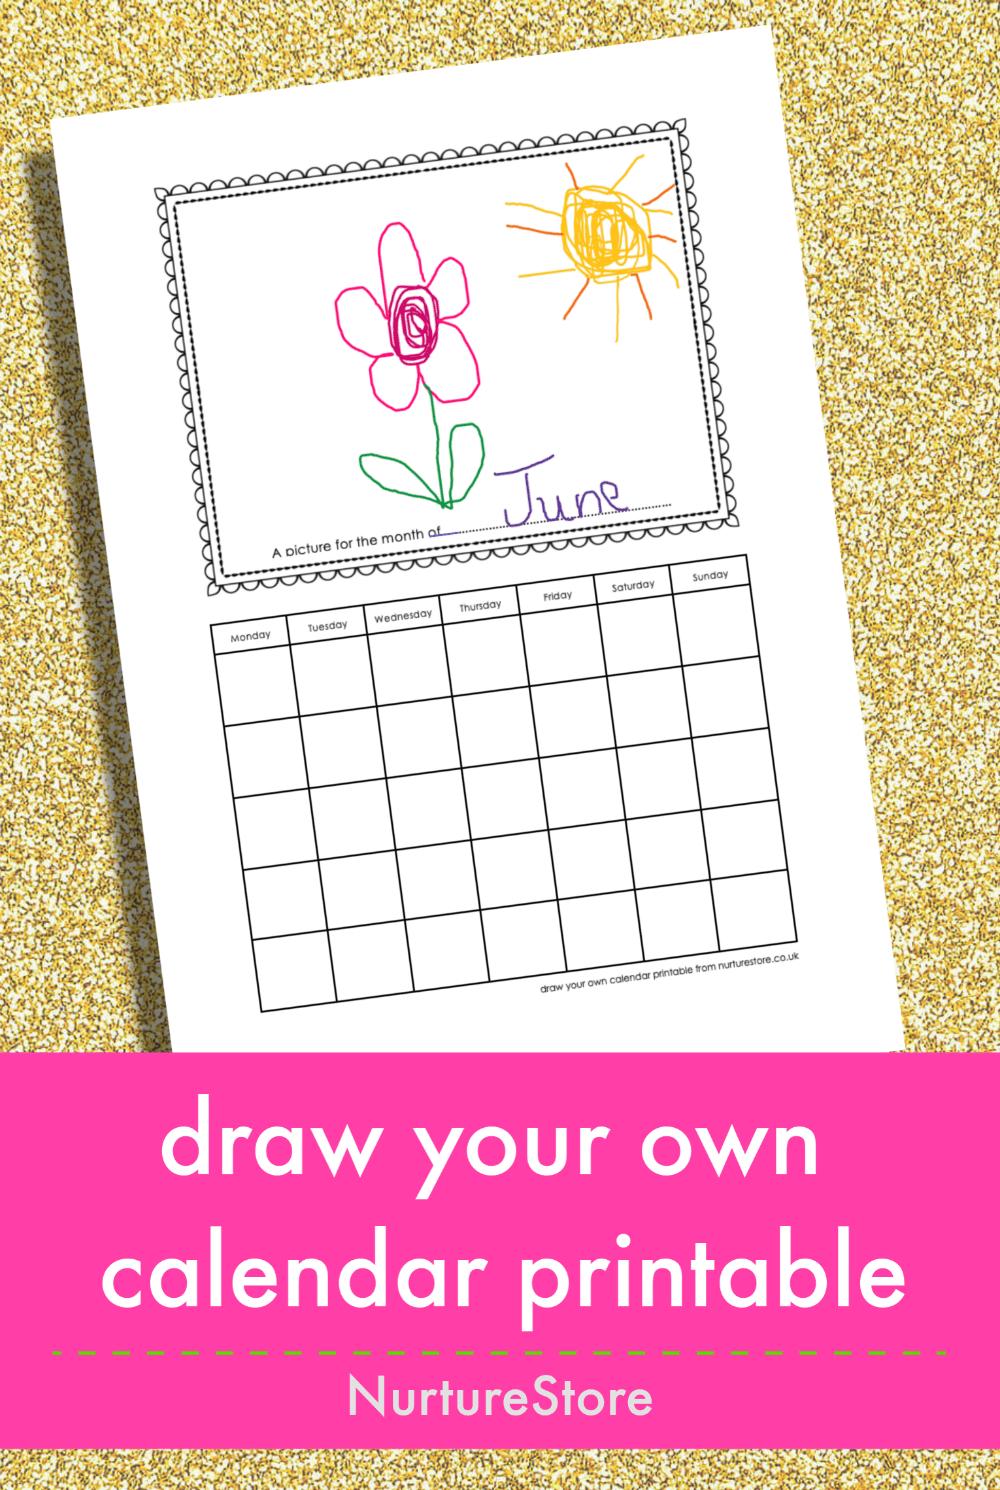 Draw Your Own Calendar Free Printable For Kids Nurturestore Kids Calendar Calendar Craft Homemade Calendar